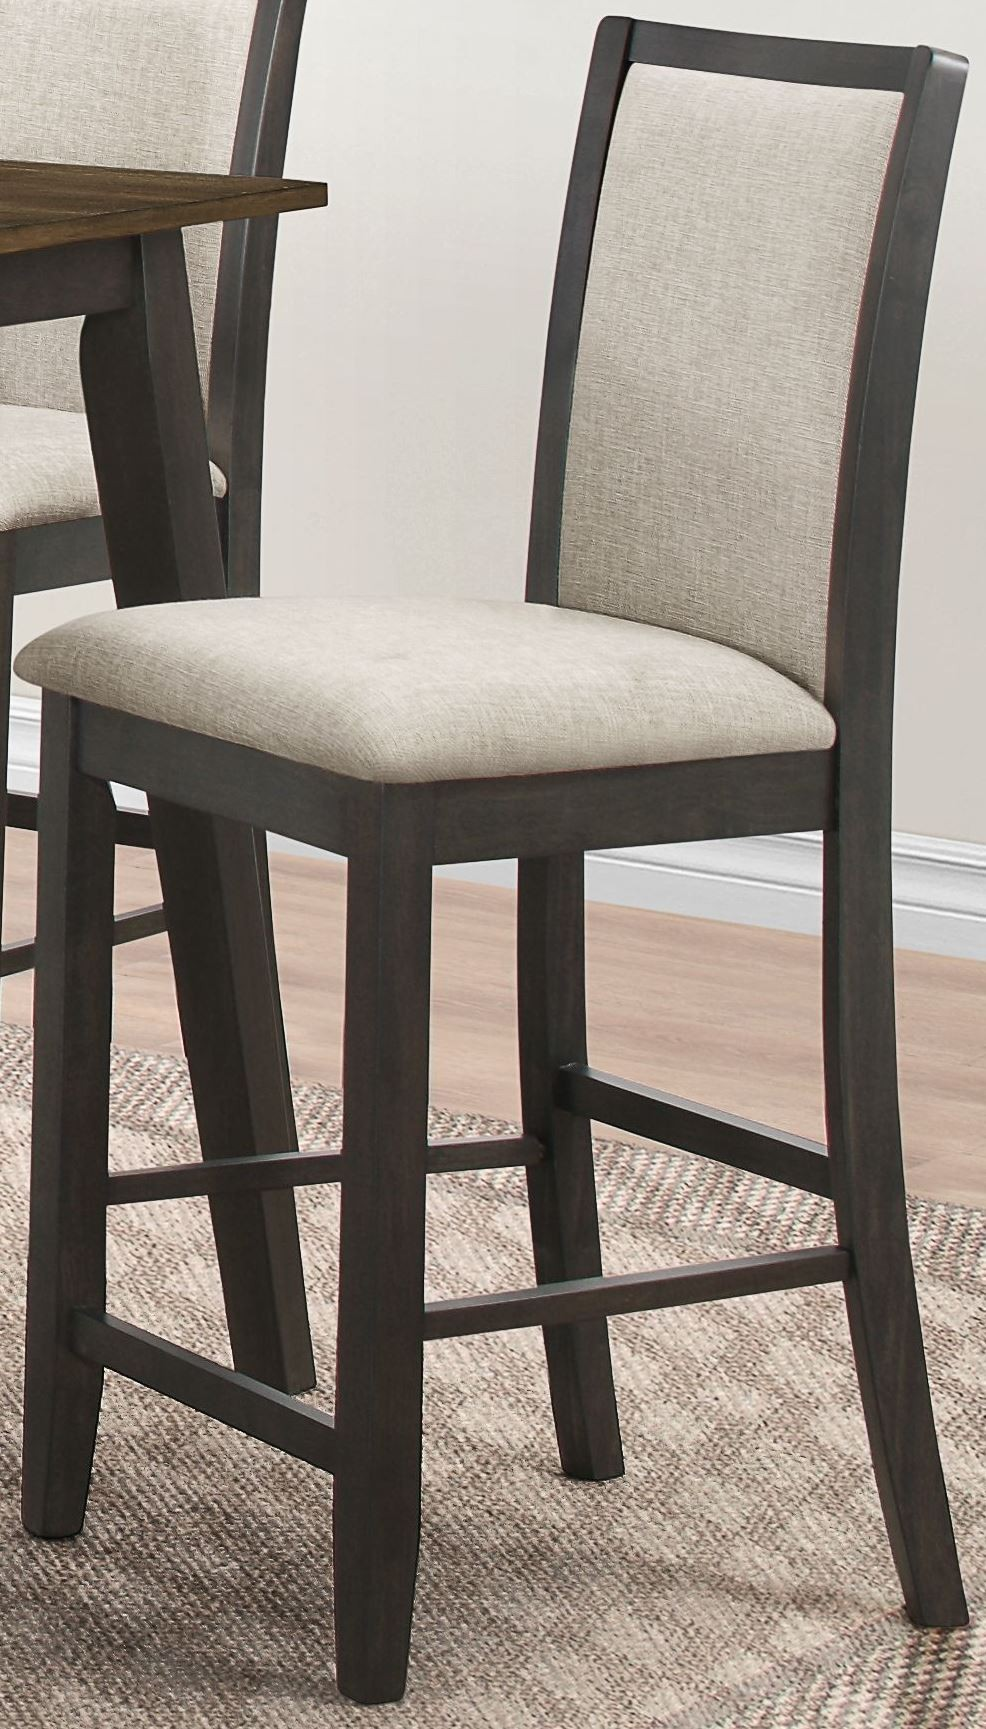 studio 26 antique oak and black counter height dining room set d2626 12 new classics. Black Bedroom Furniture Sets. Home Design Ideas